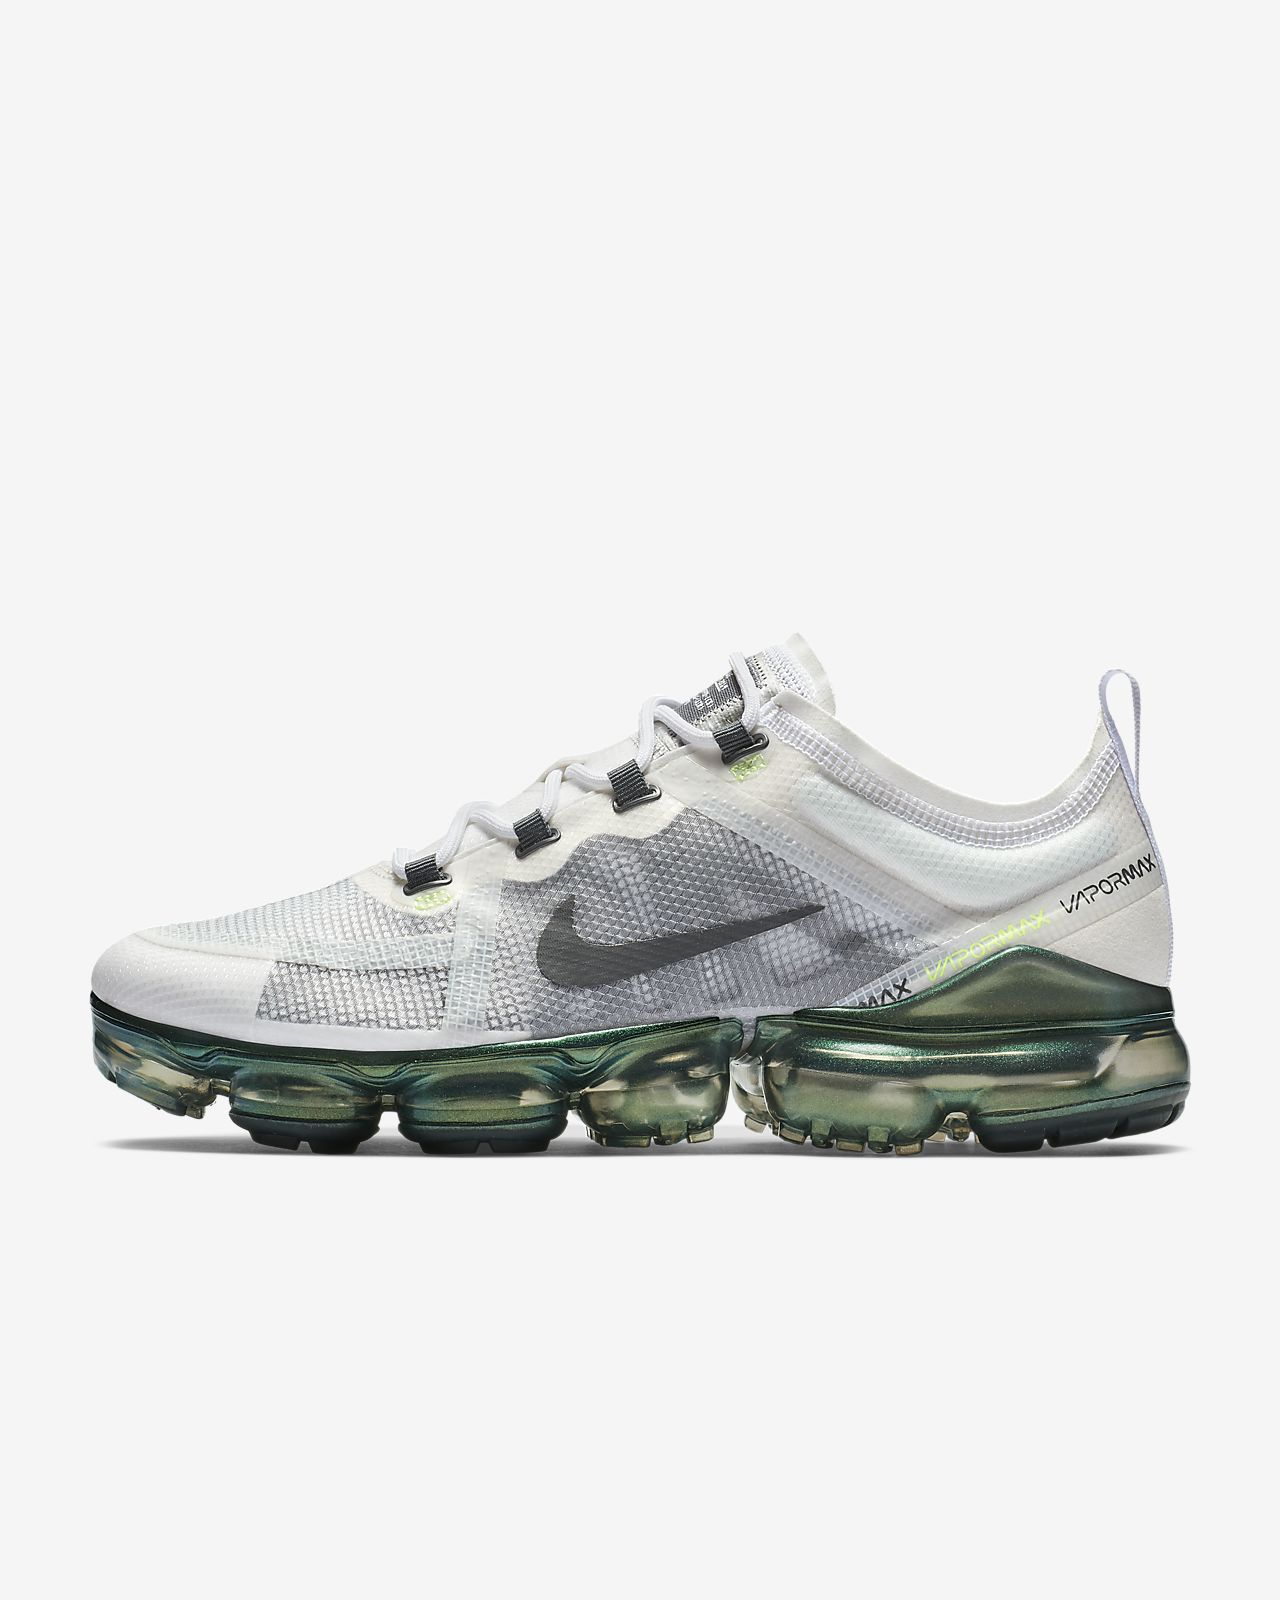 dfa1608642cde Nike Air VaporMax 2019 Premium Shoe. Nike.com CA